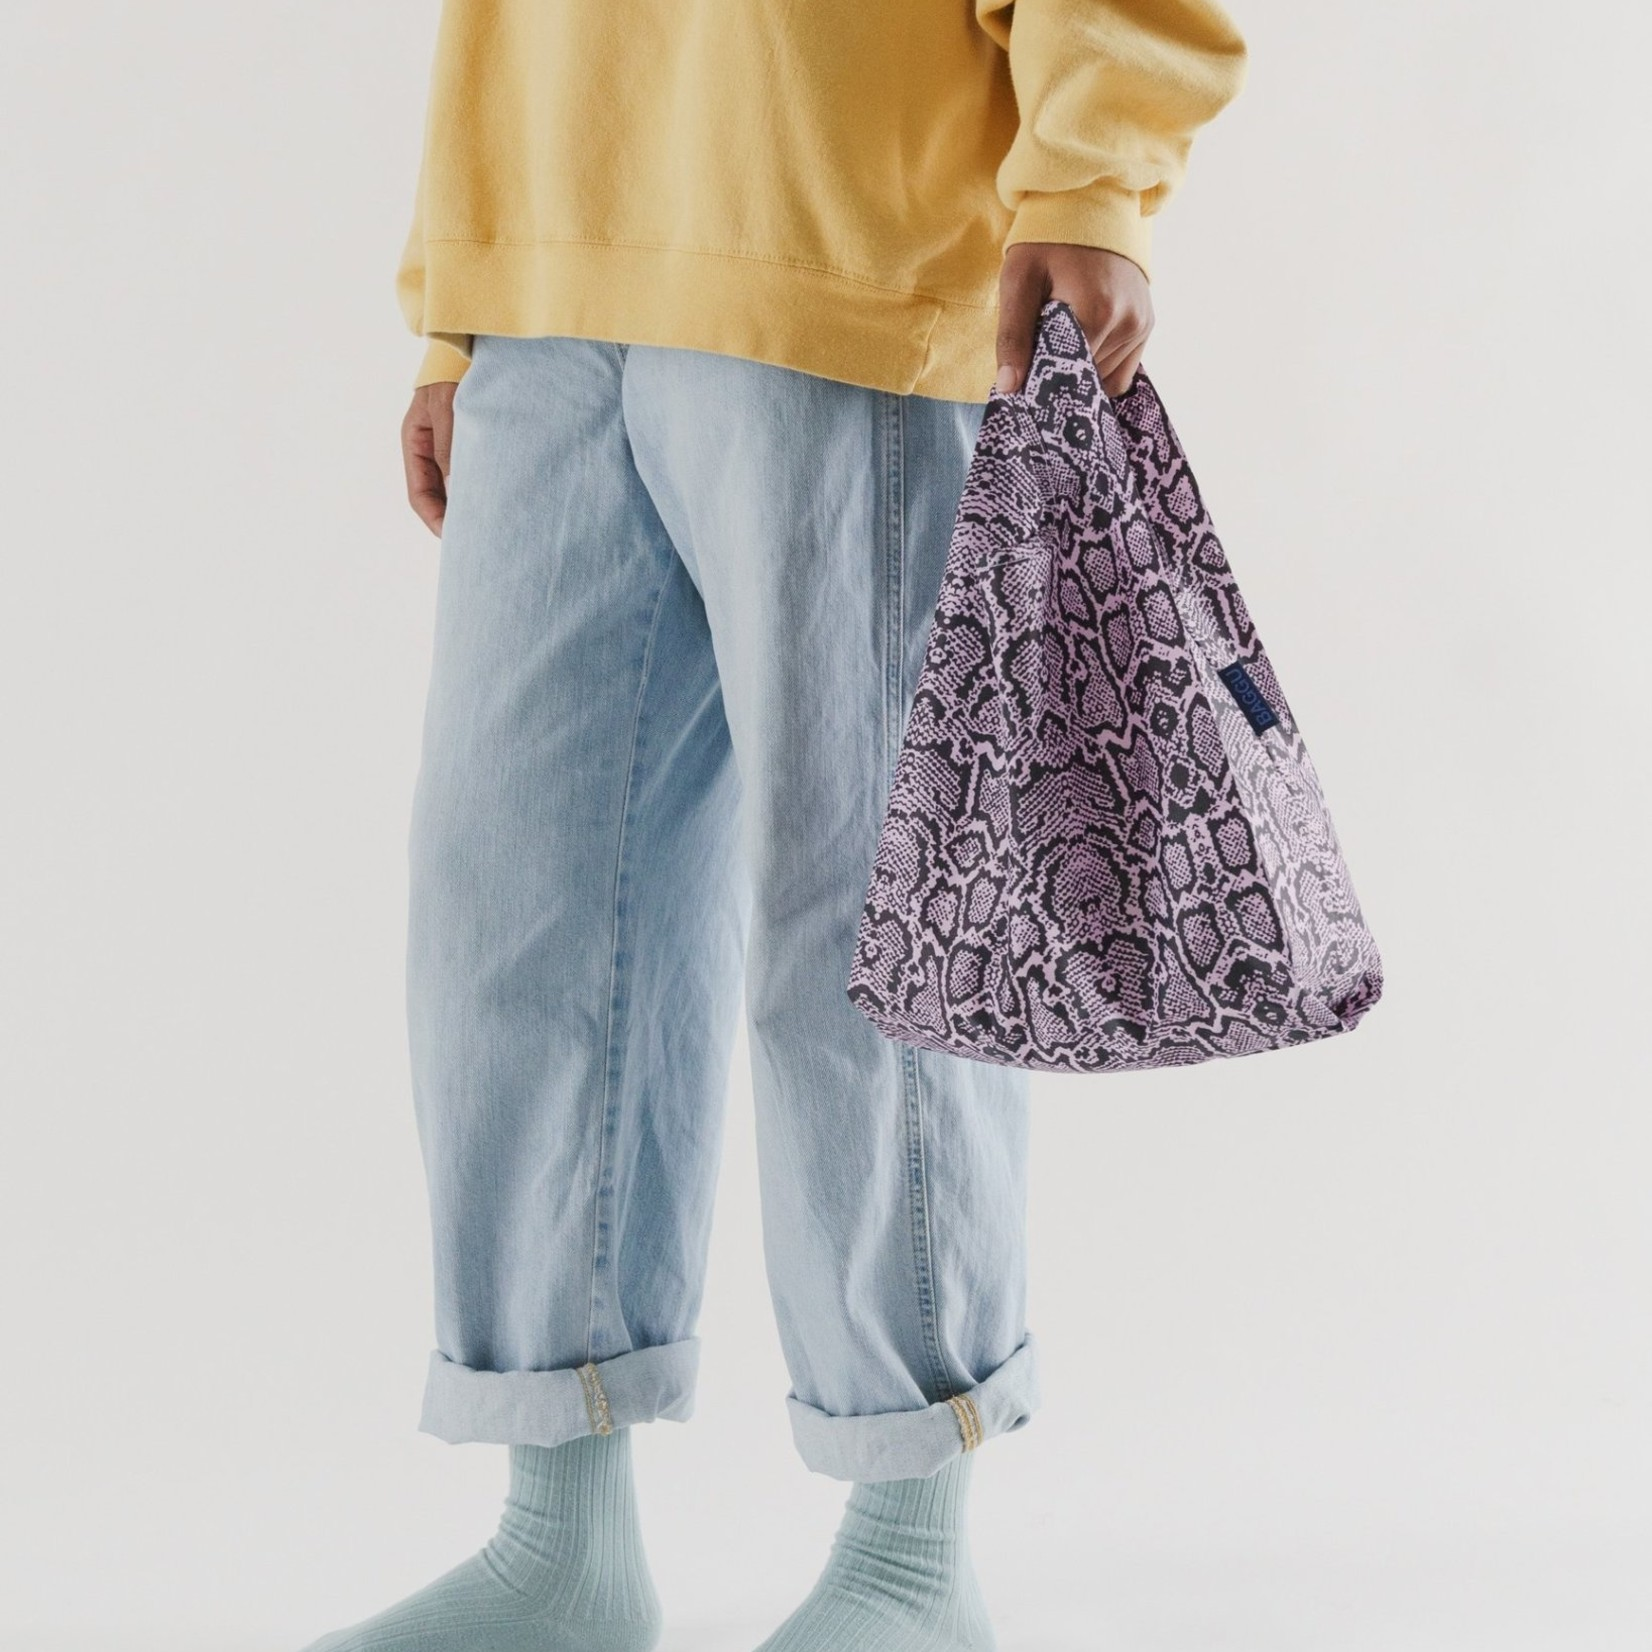 Baggu Baggu Reusable Bag Baby Pink Snakeskin